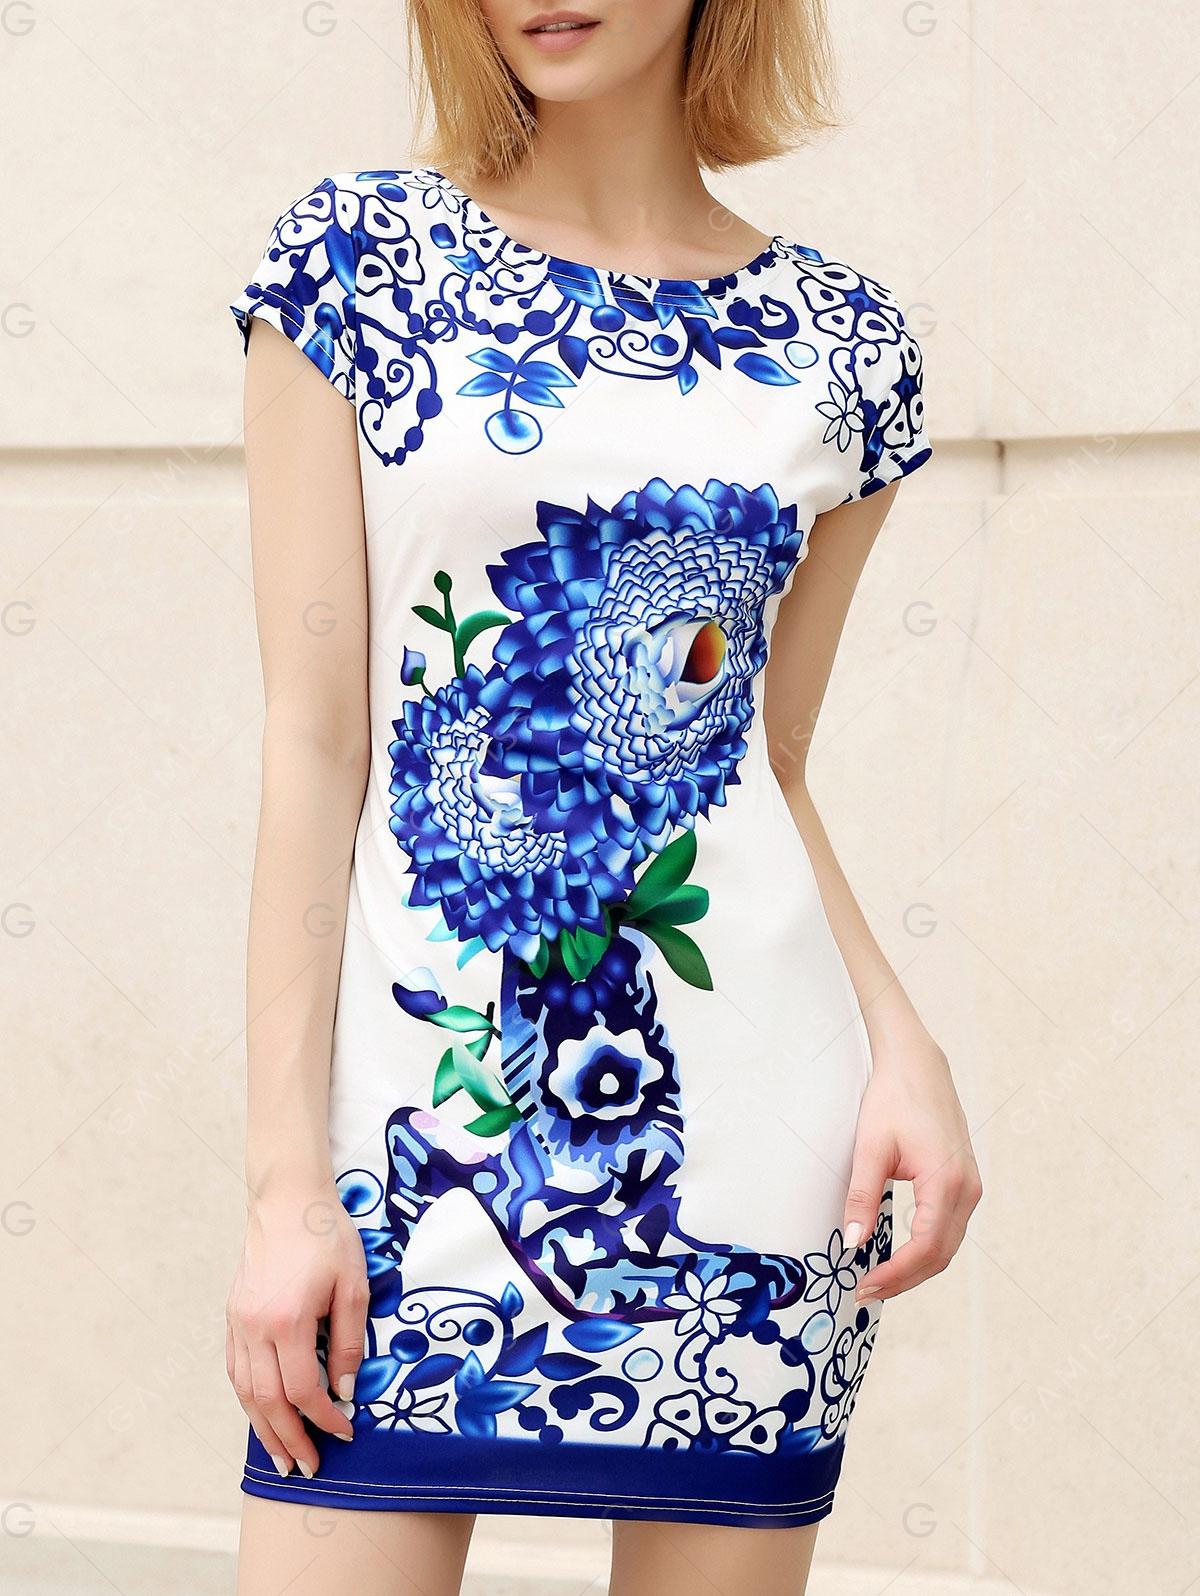 Trendy Round Collar Short Sleeve Floral Print Skinny Women's Dress